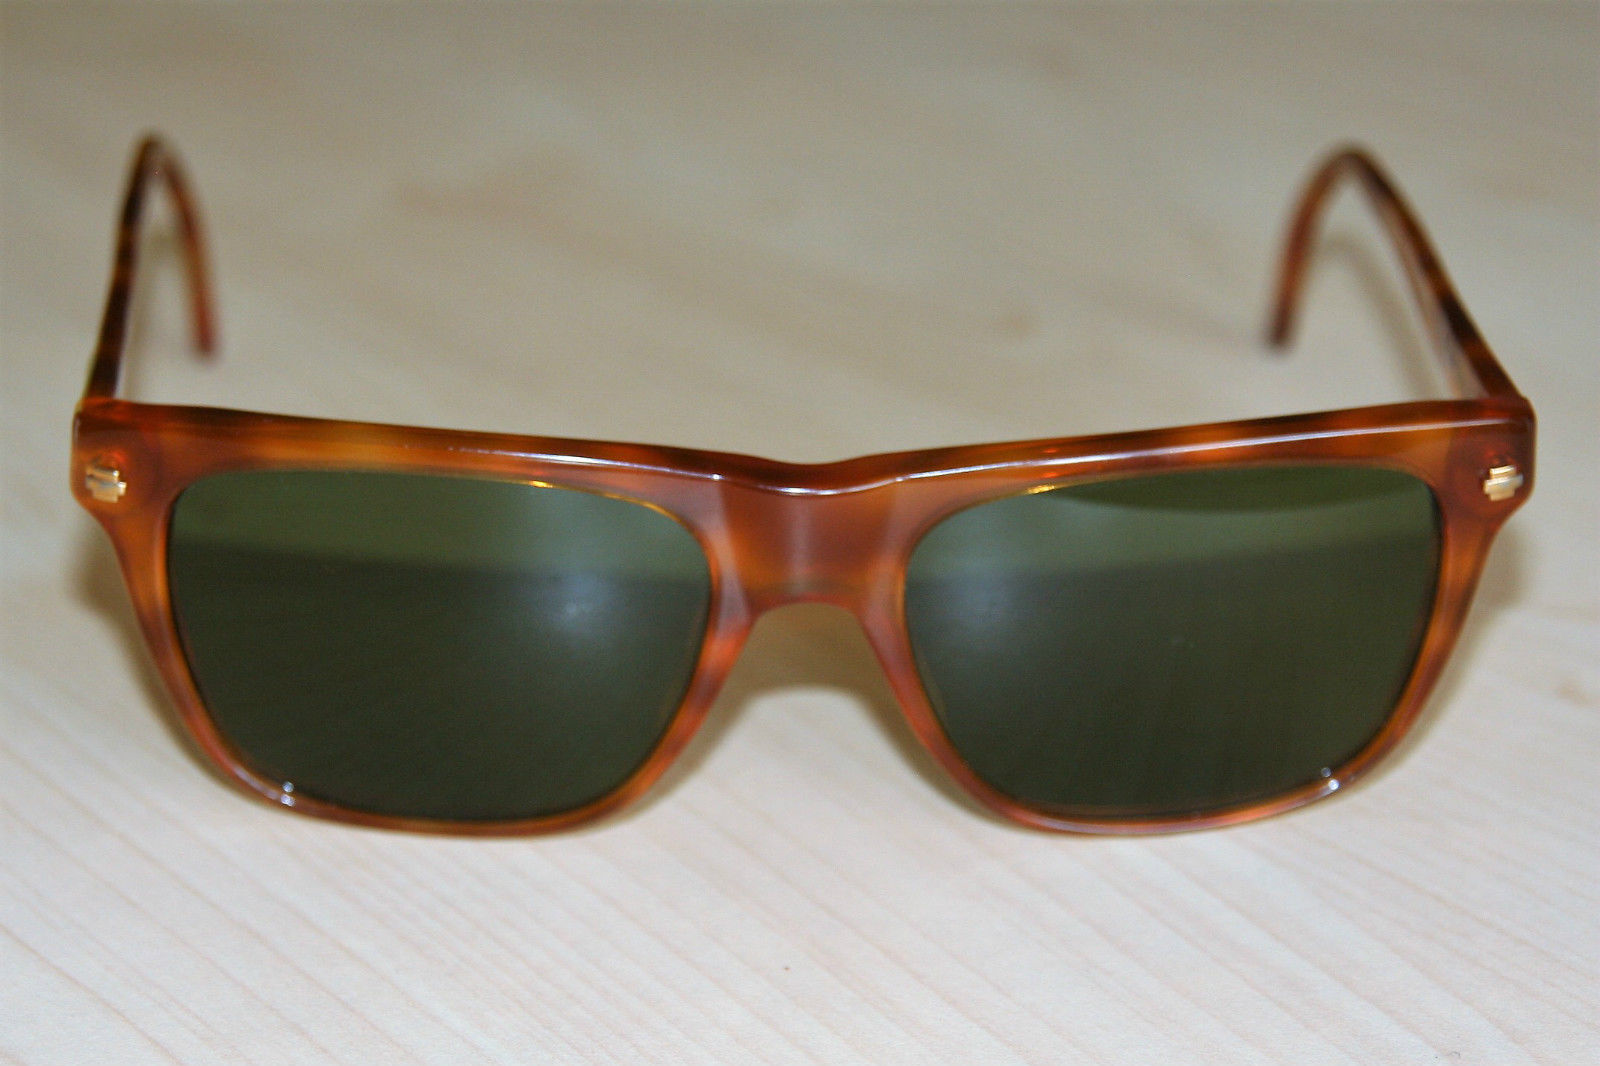 60bb5c24b44ac5 More Sunglasses. juicyorange 865 ray ban ...